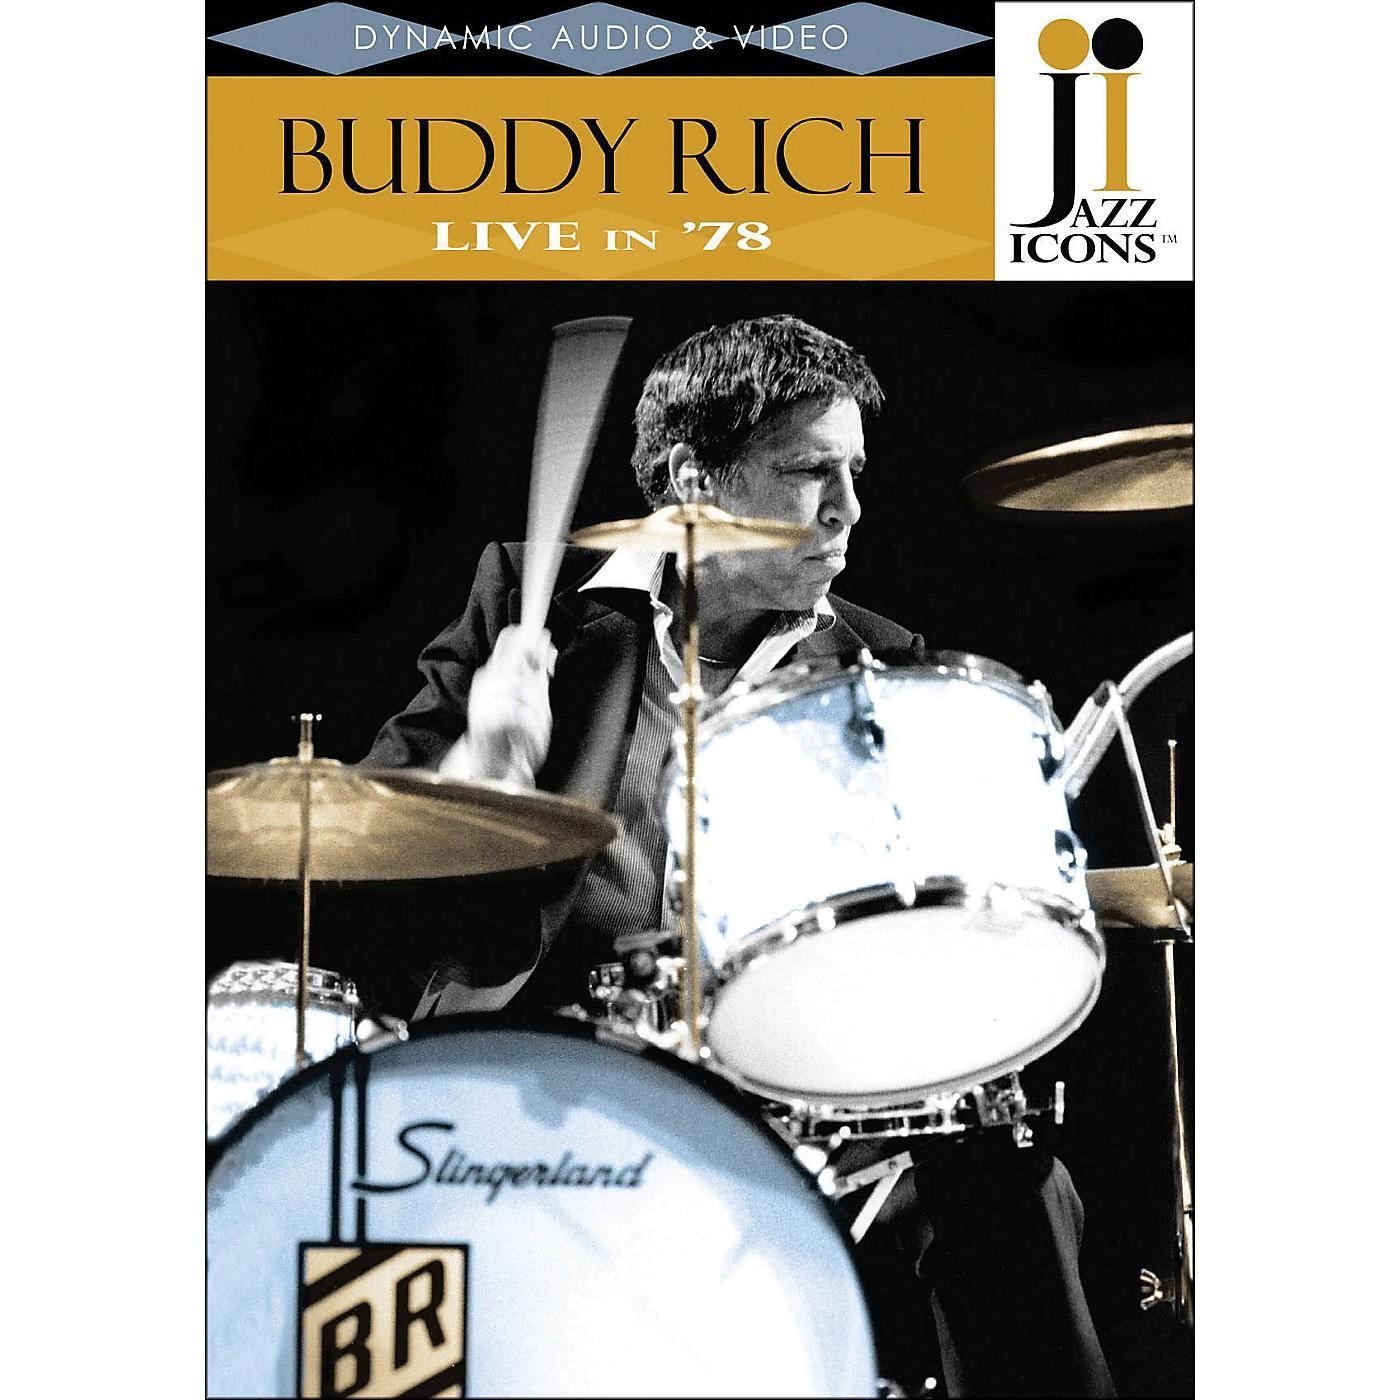 Hal Leonard Buddy Rich Live In '78 DVD Jazz Icons thumbnail